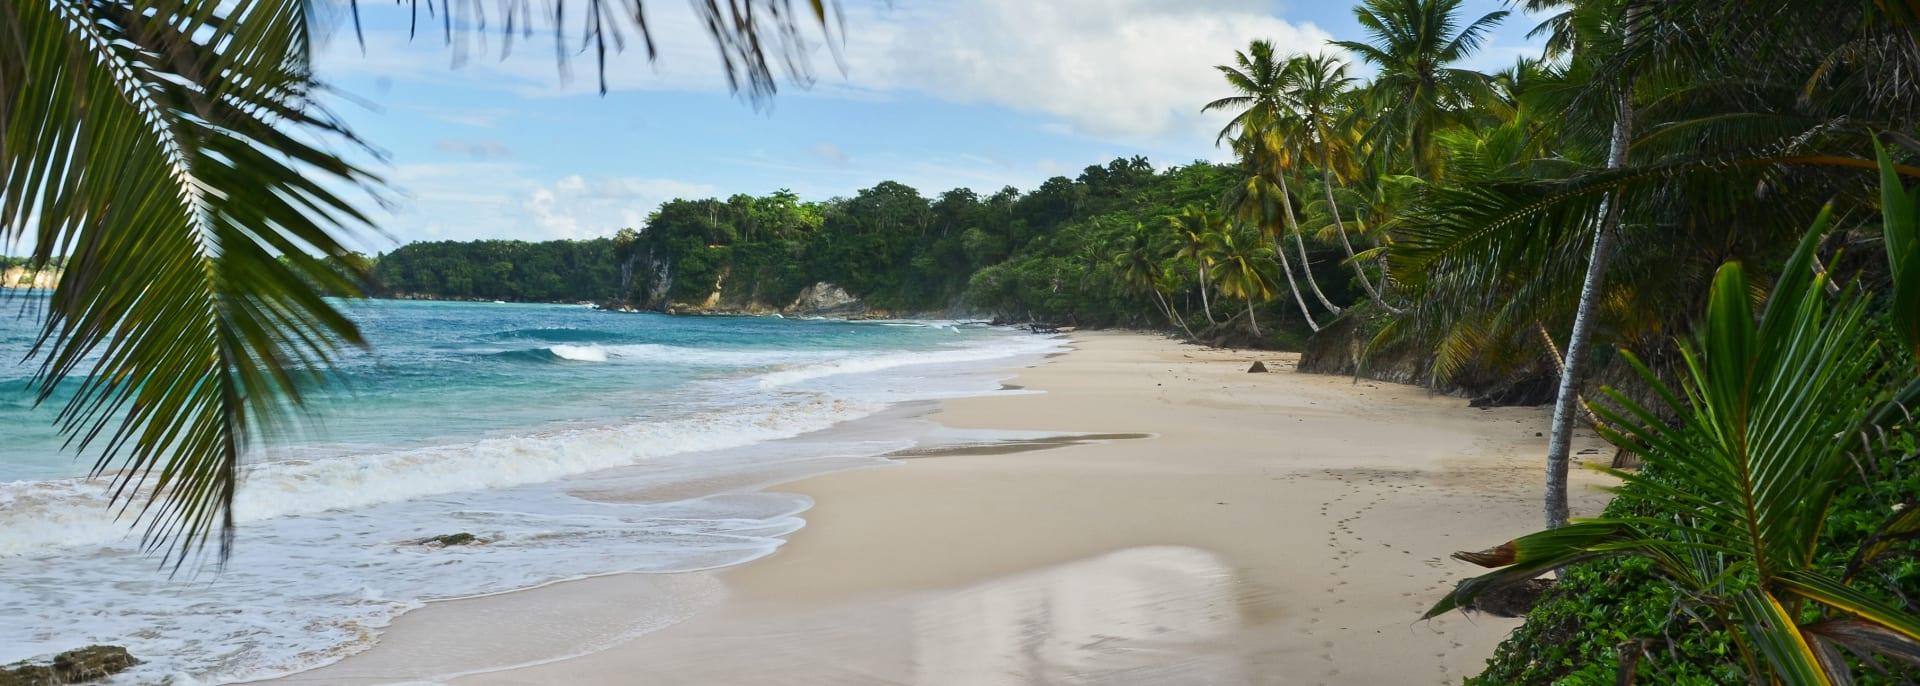 Sandy beach in northen part of Dominican Republic